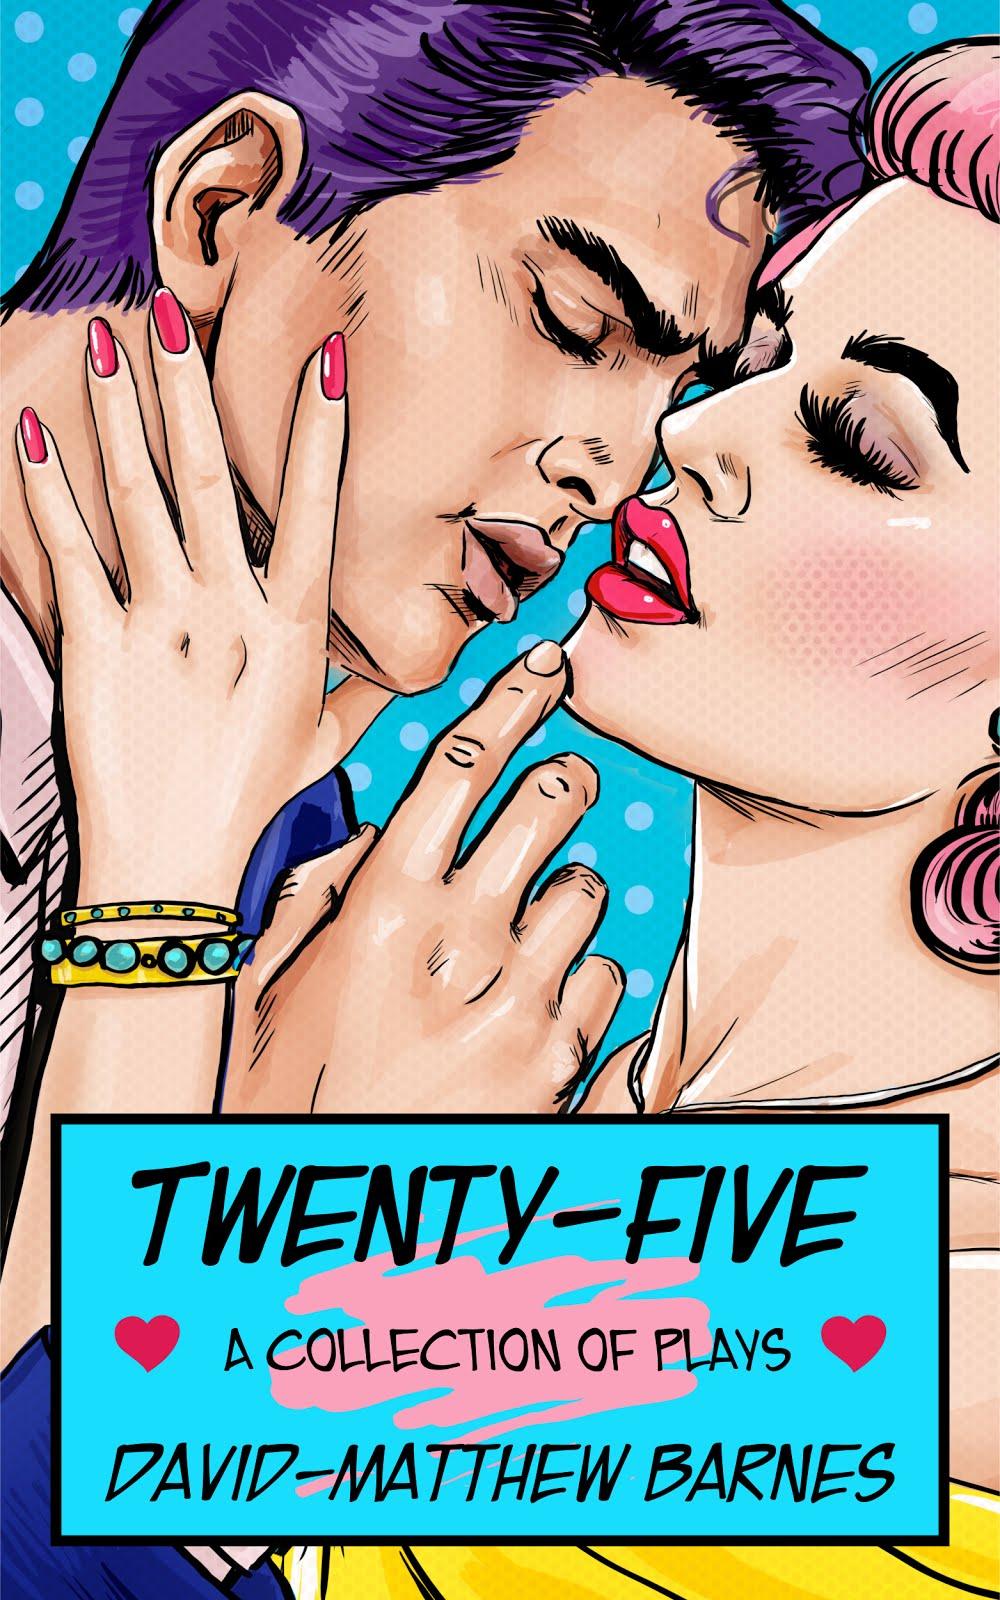 TWENTY-FIVE